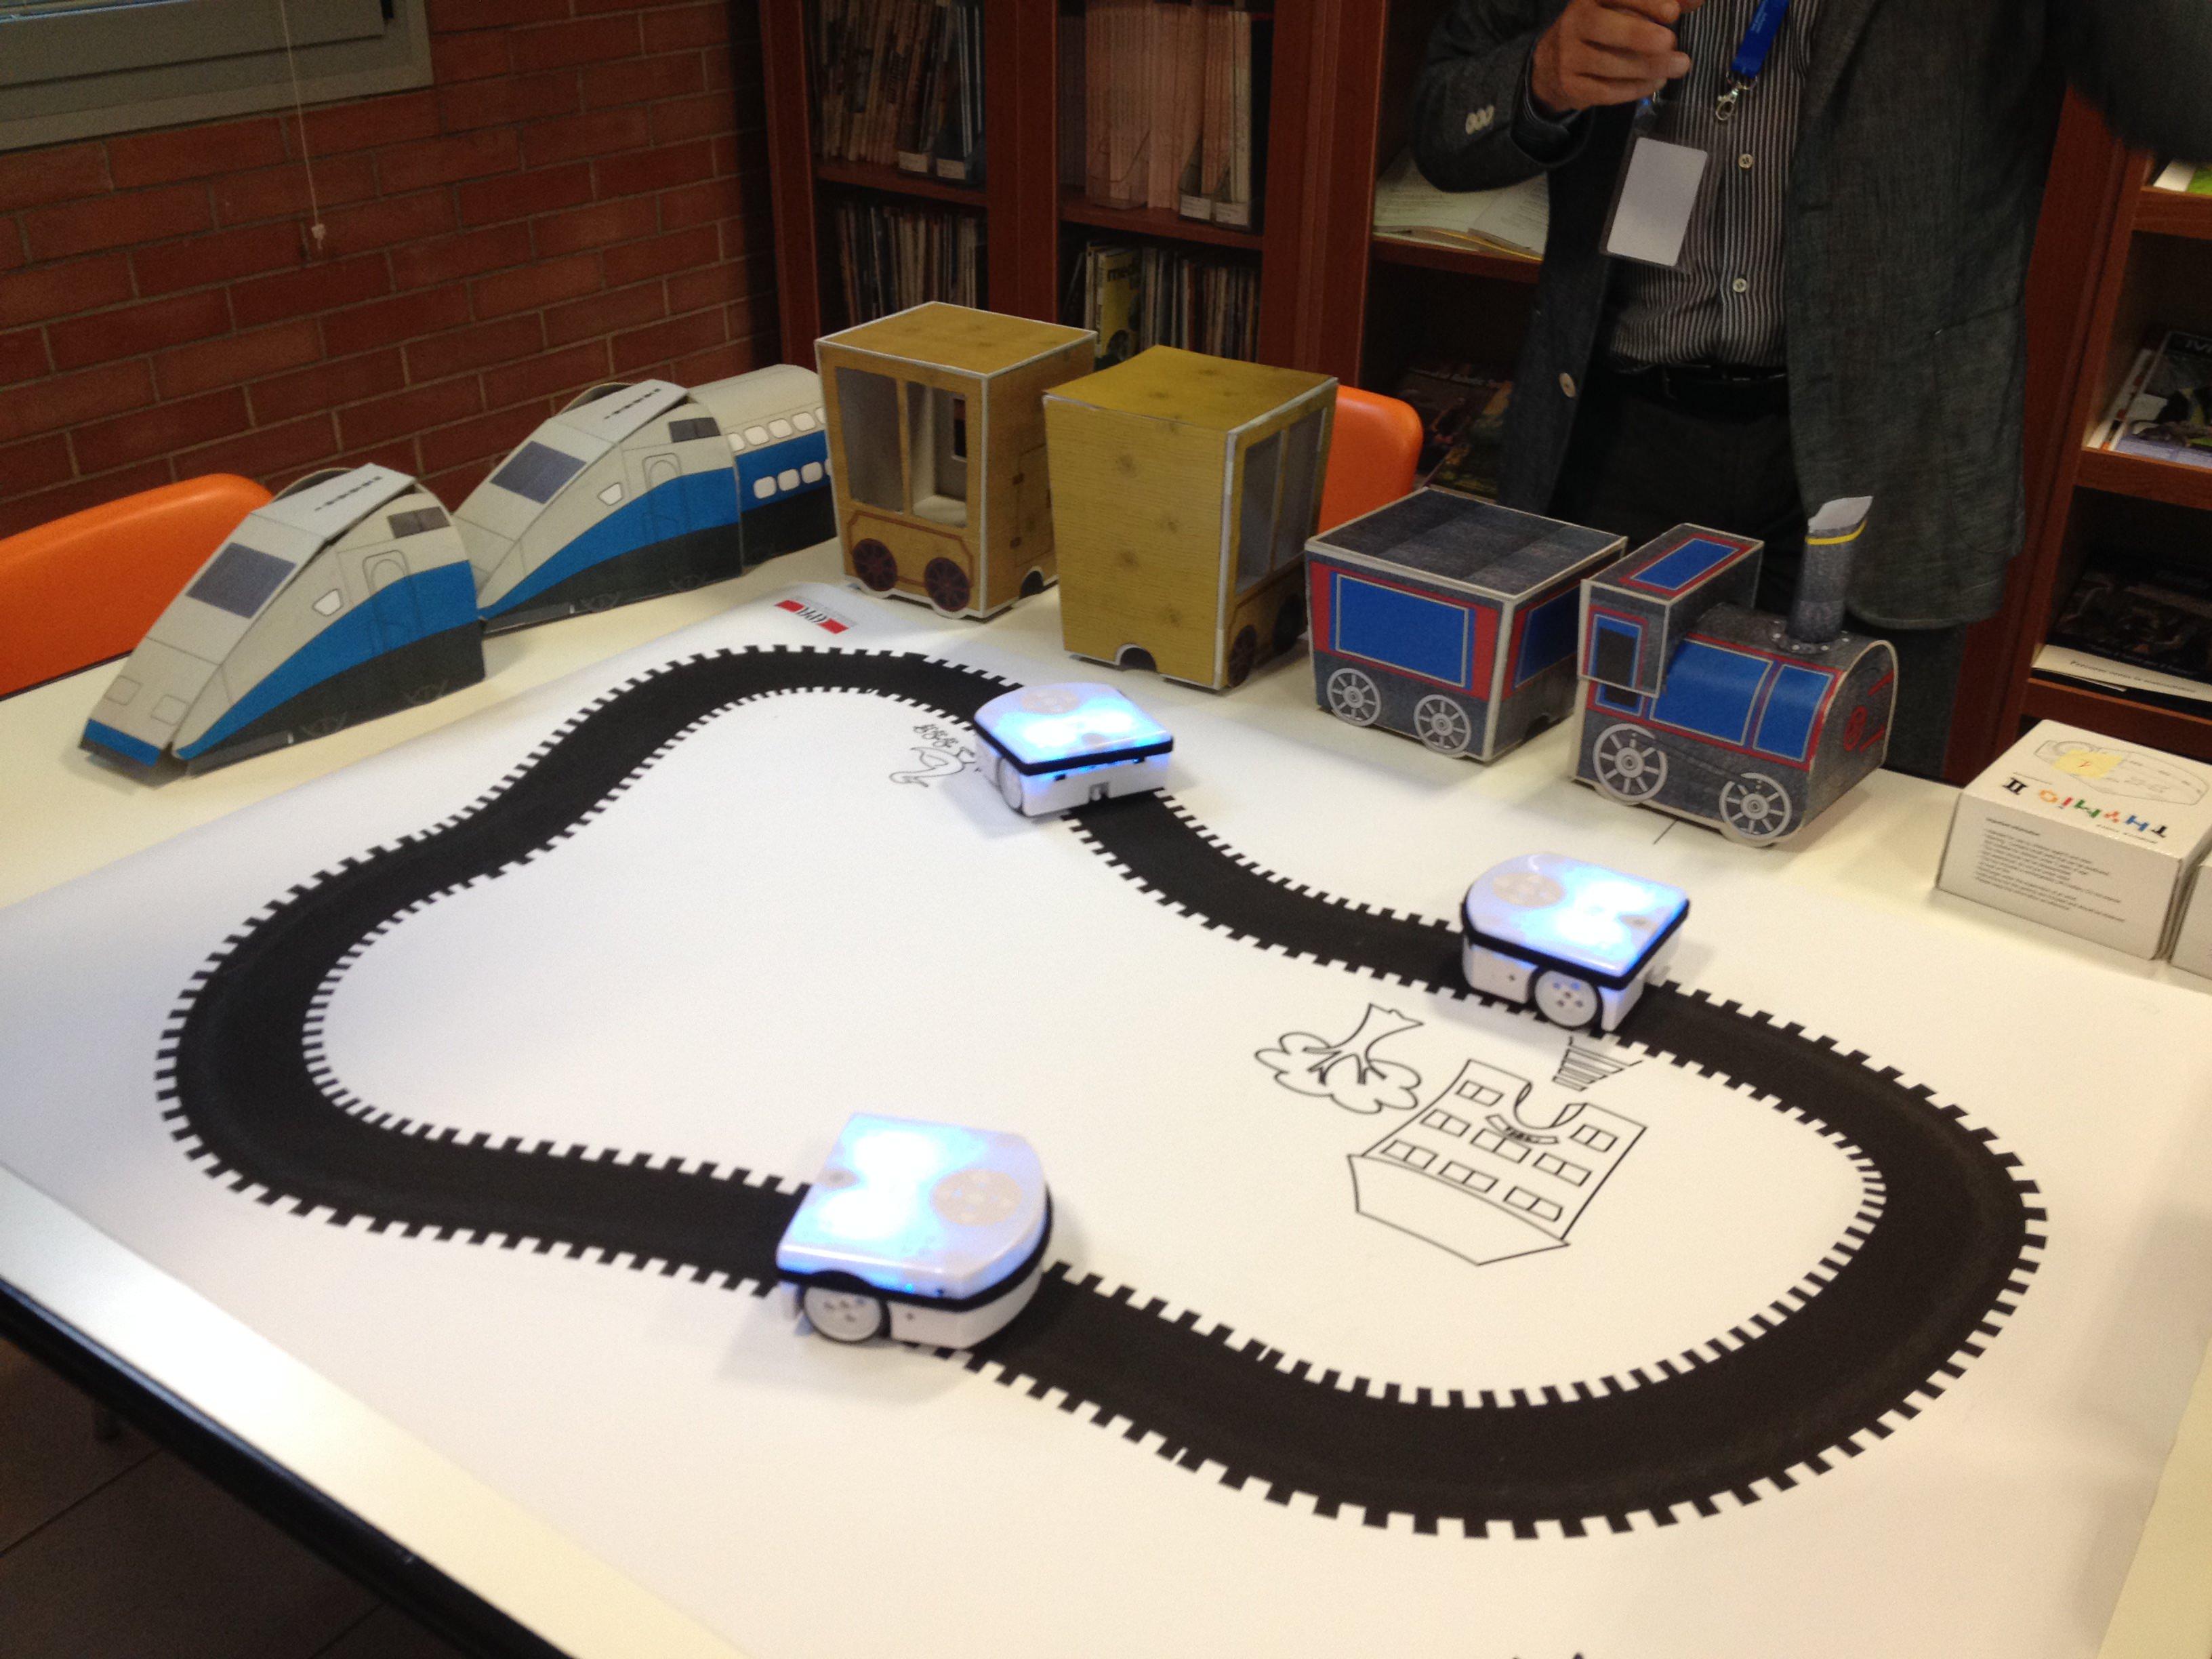 EPFL Thymio robot kit